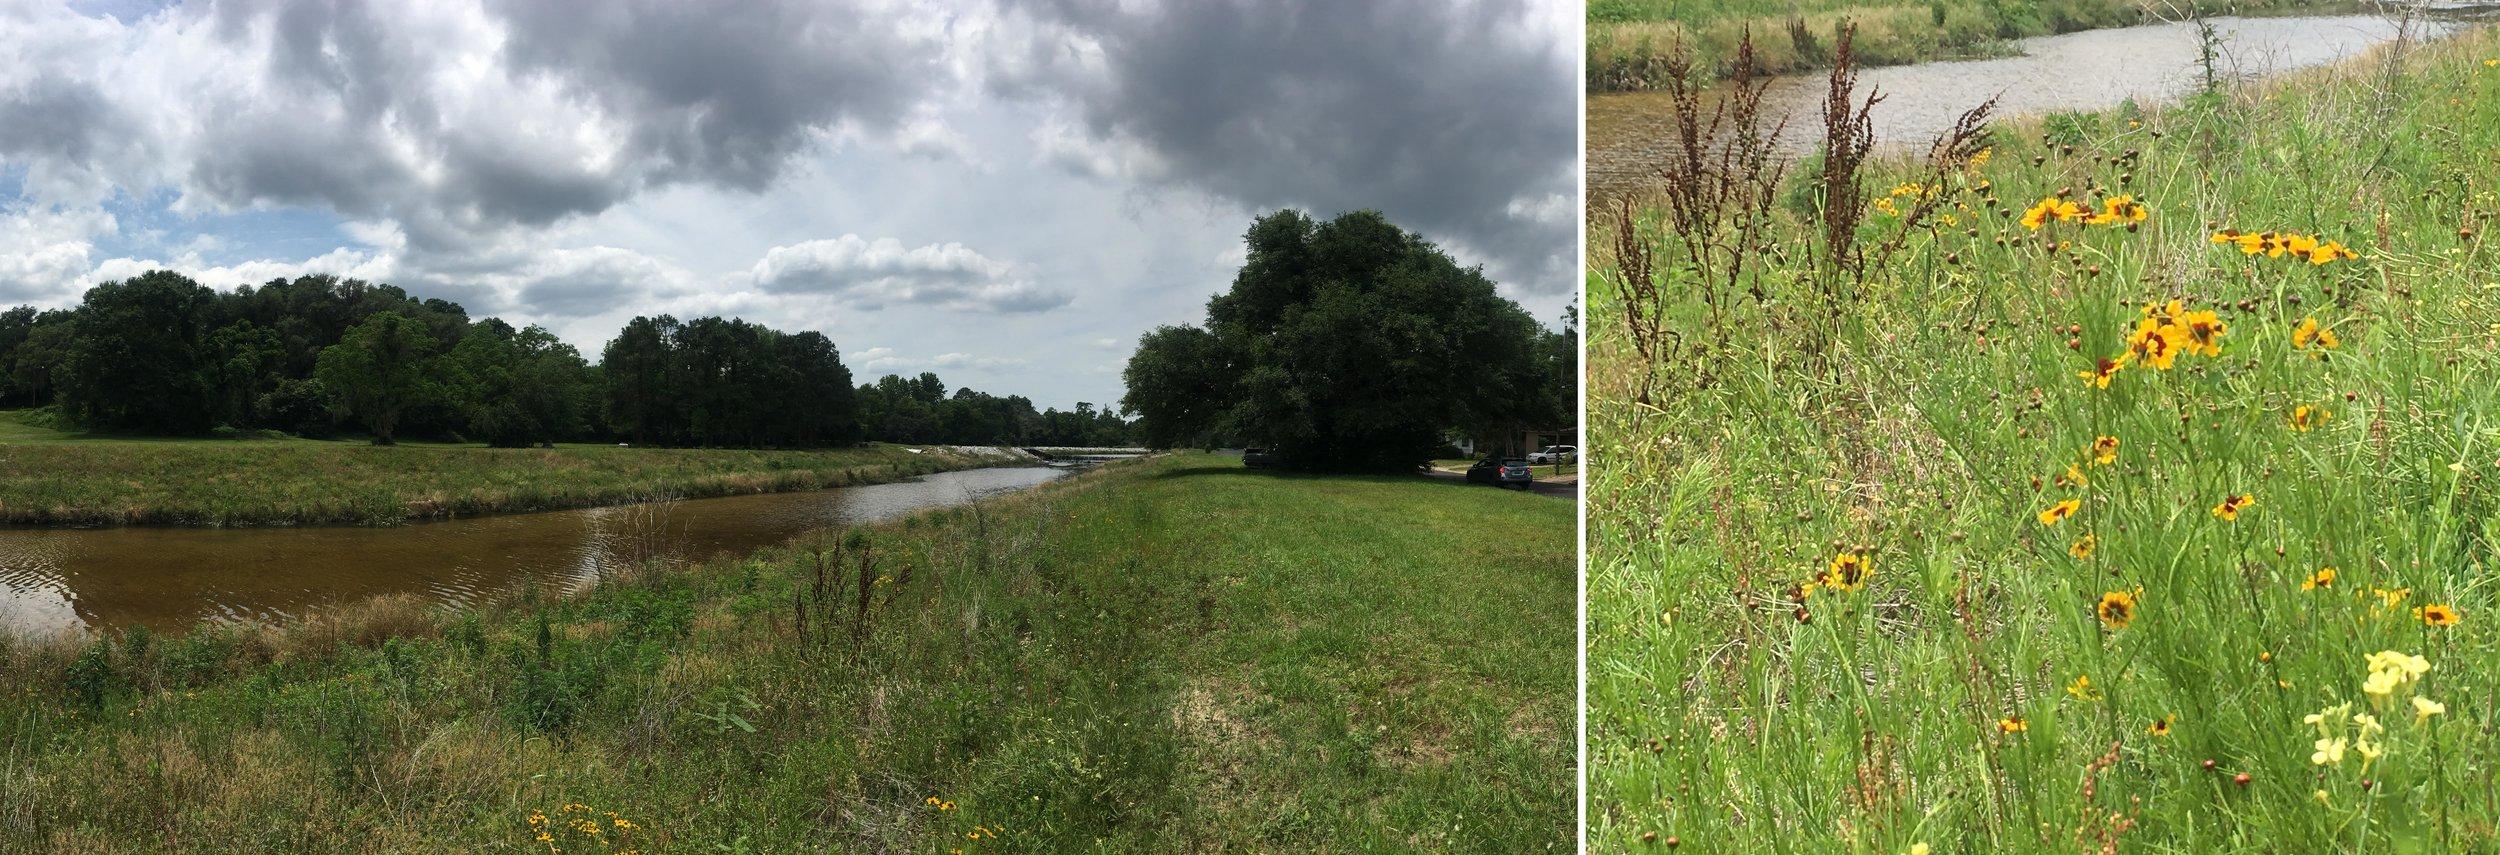 Park+Creek+Ecology.jpg